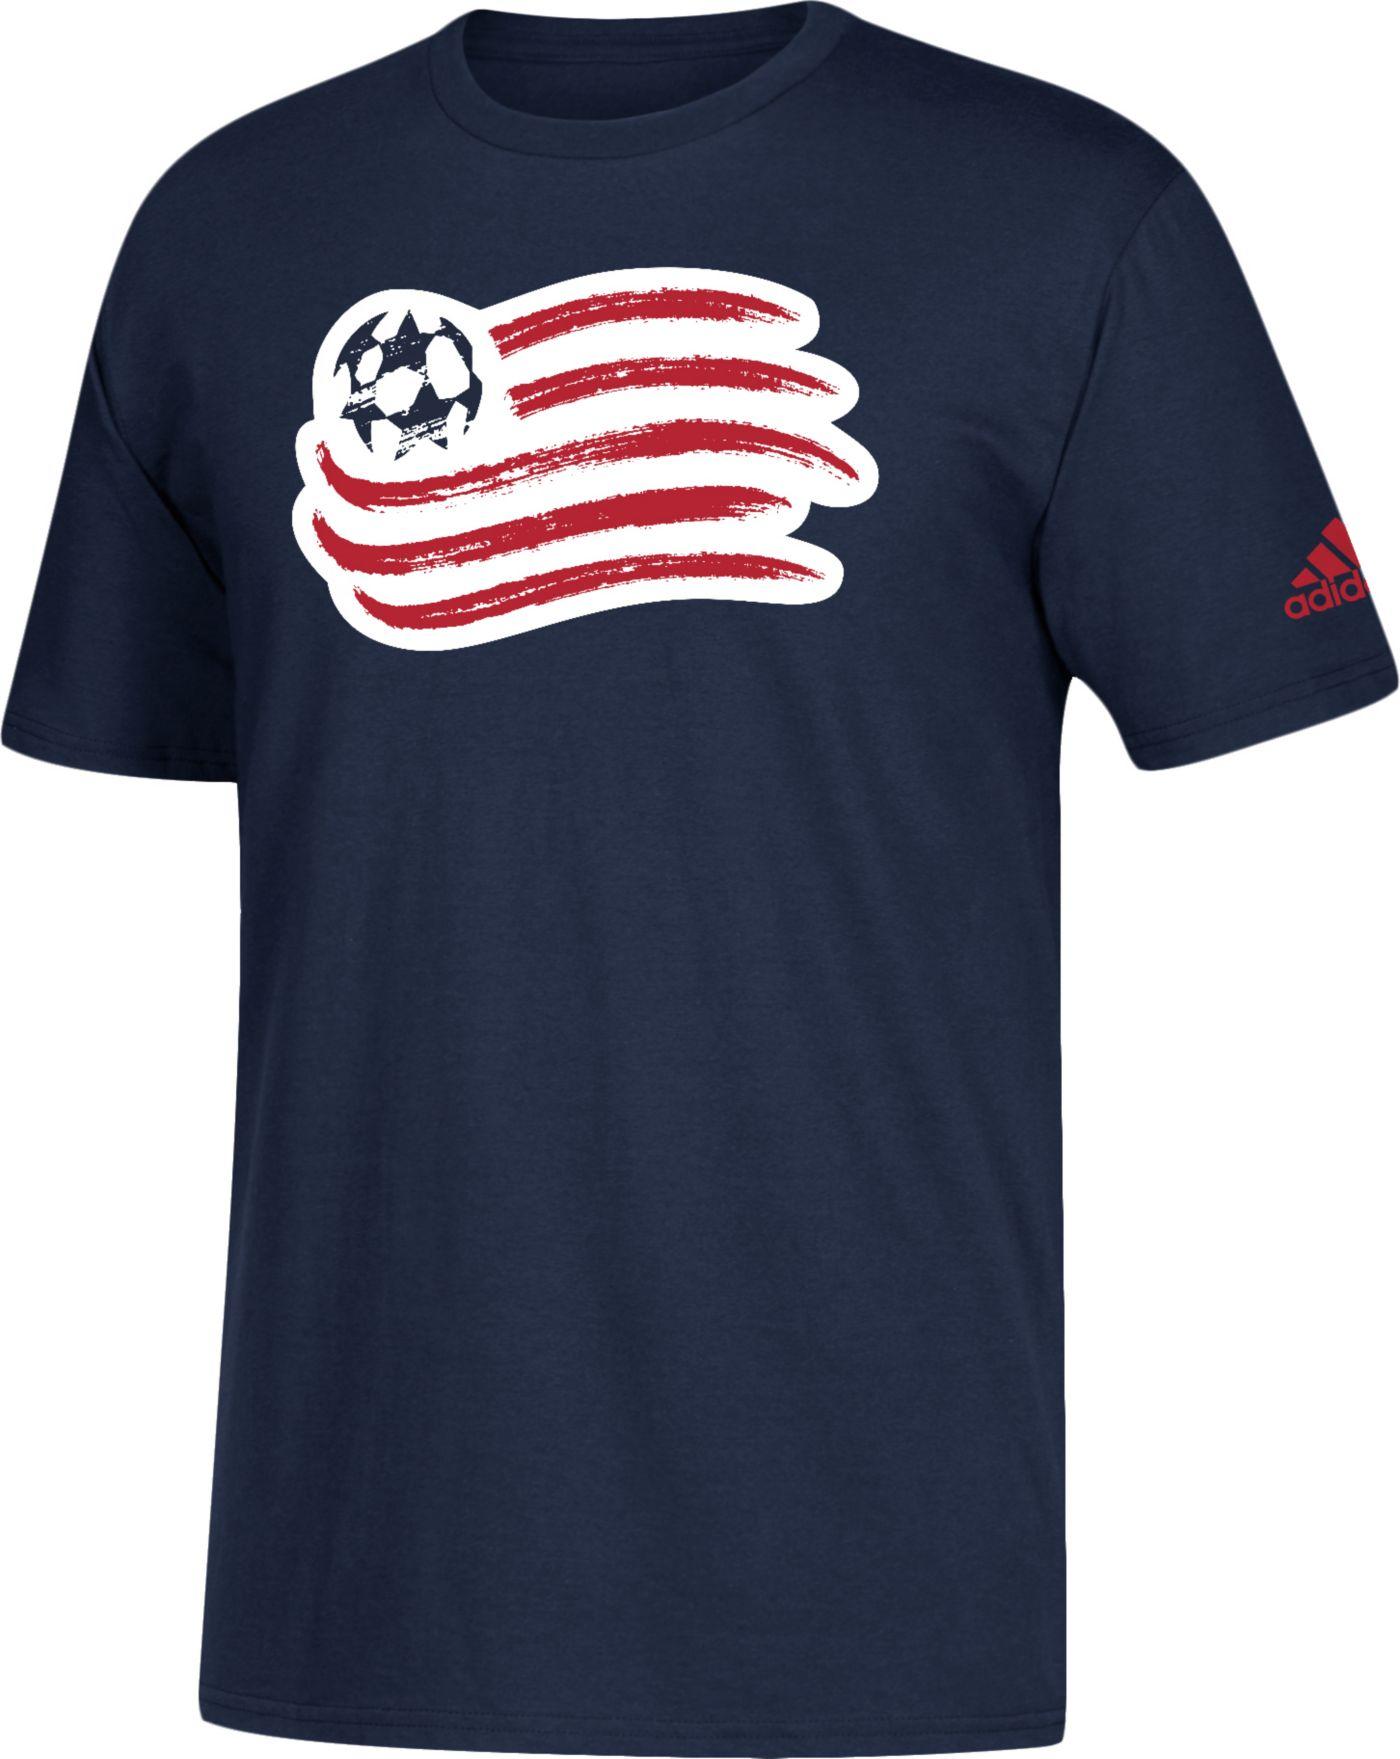 adidas Men's New England Revolution Big Logo Navy T-Shirt